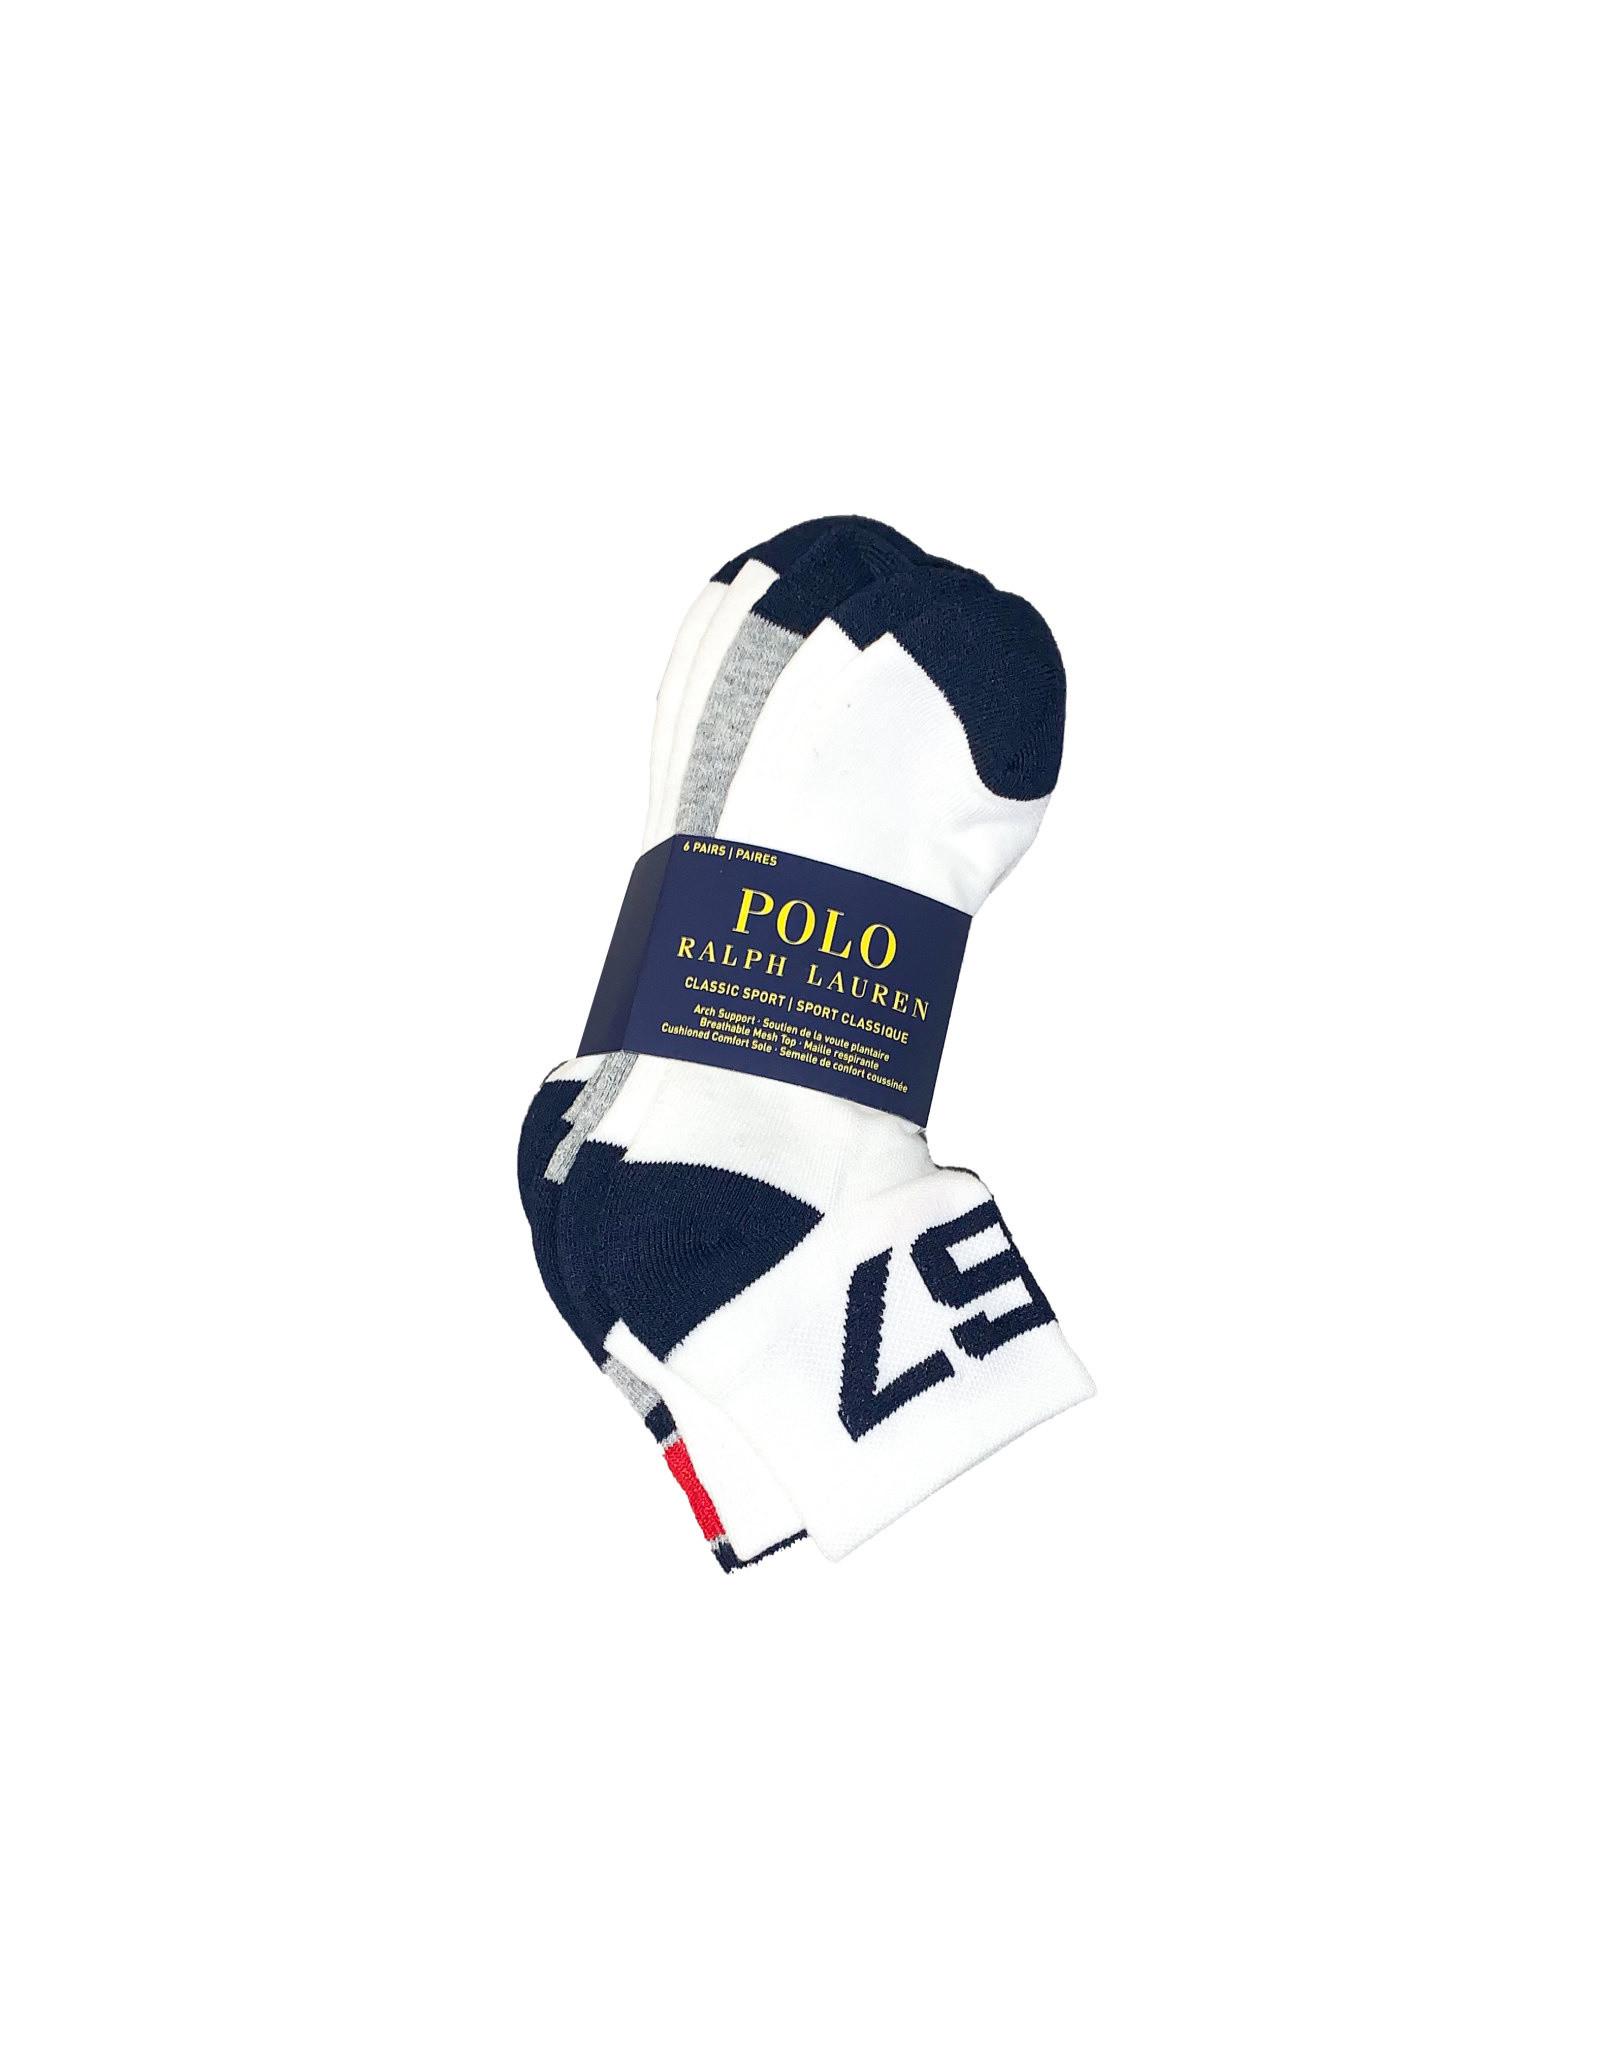 POLO RALPH LAUREN Polo Ralph  Lauren  Socks  5 pc Size 10-13